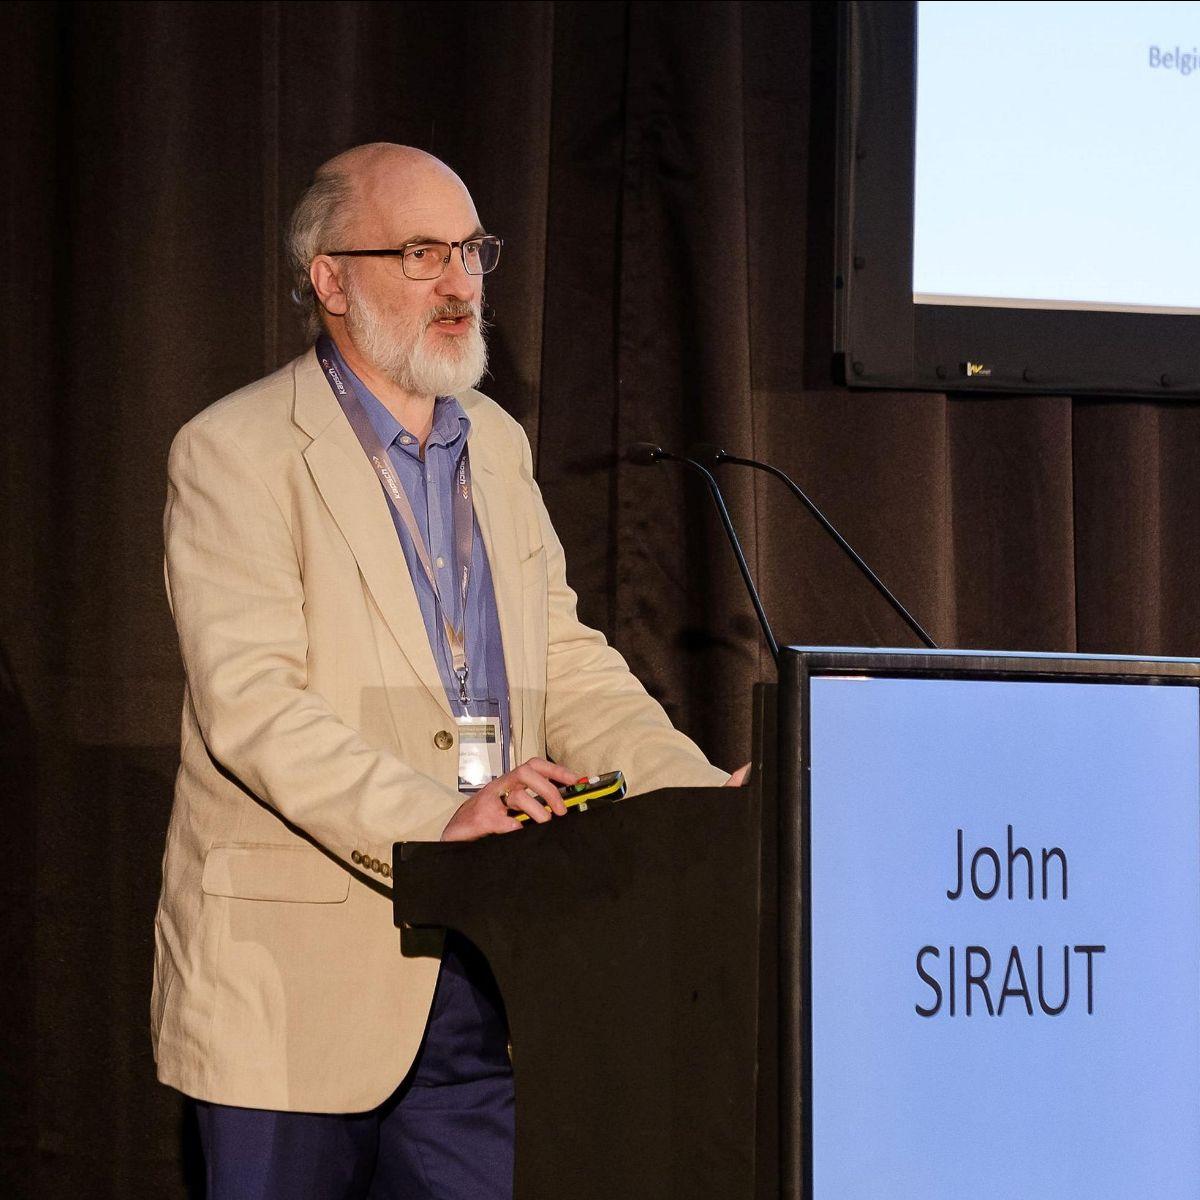 John Siraut